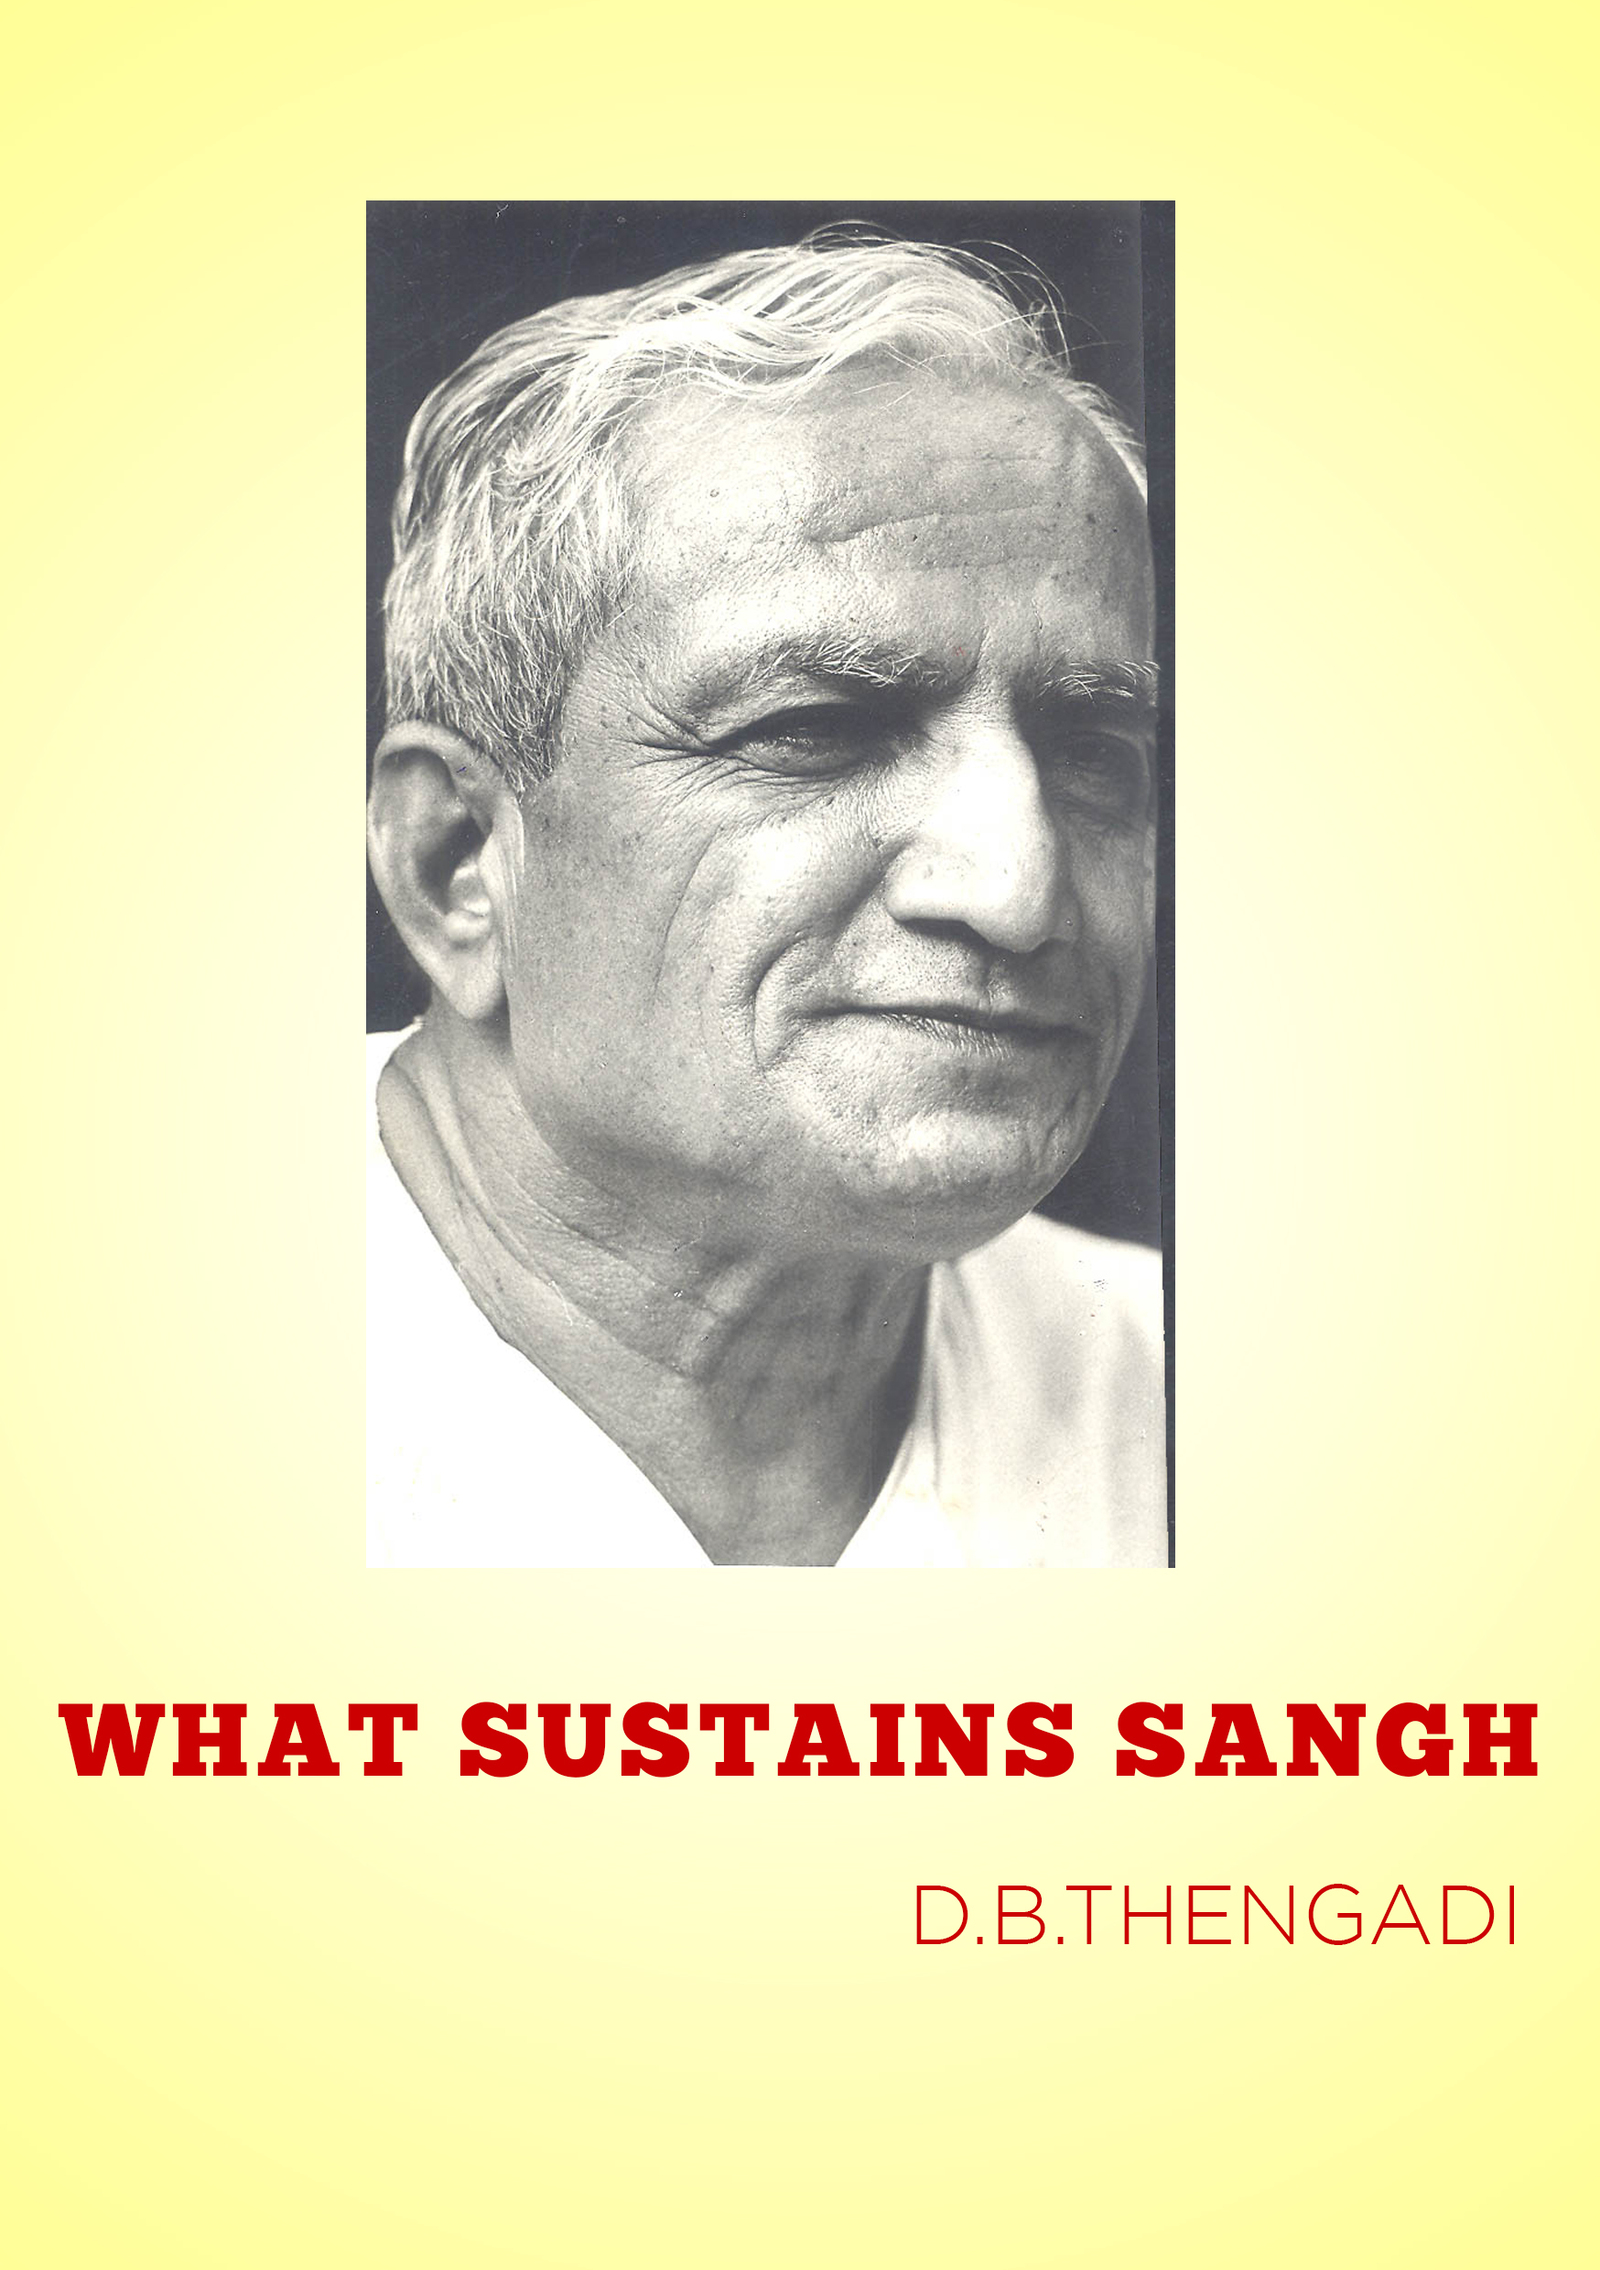 What Sustains Sangh